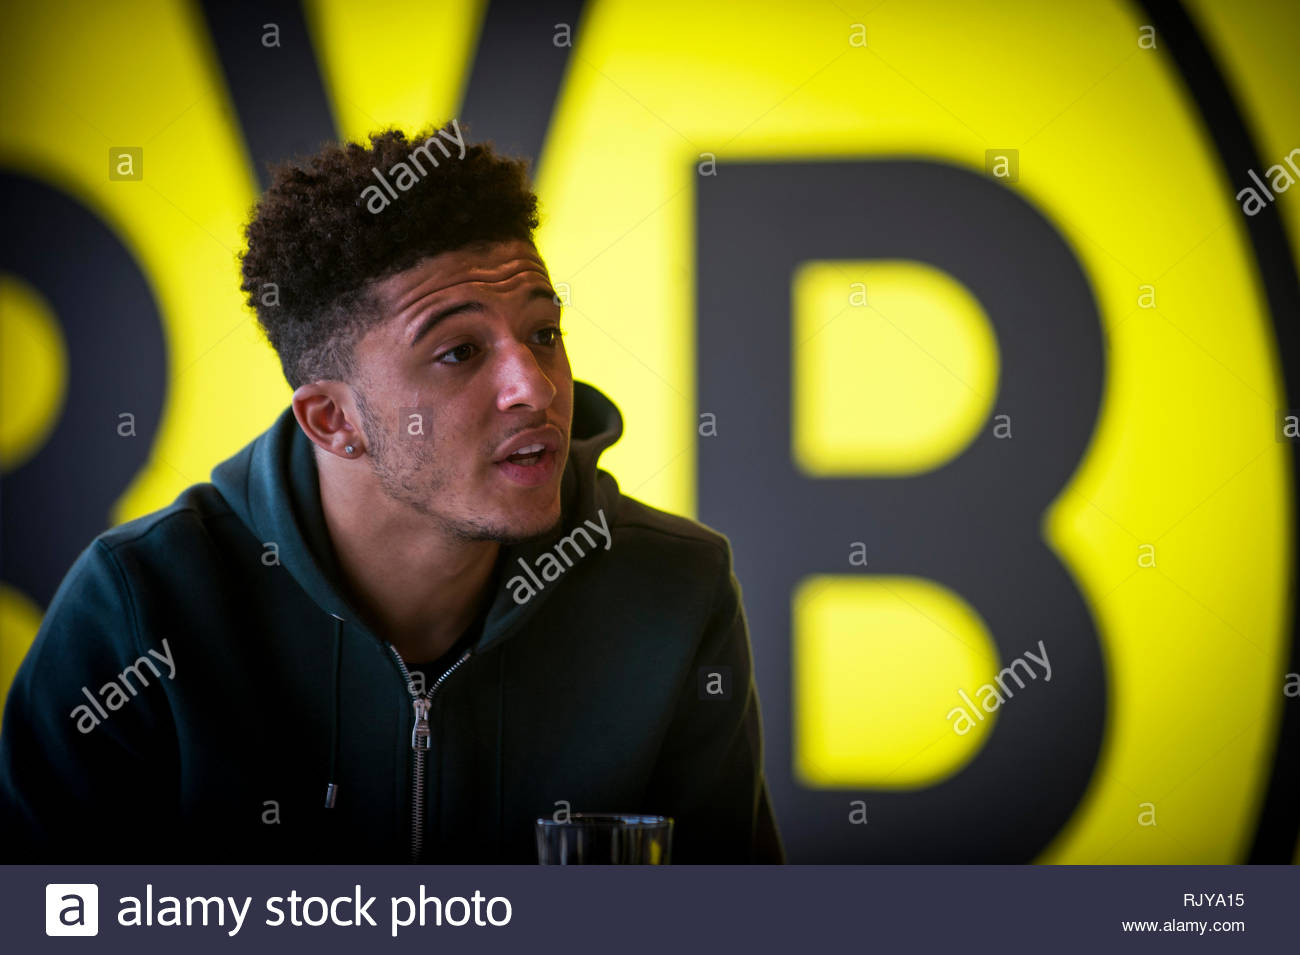 18 year old Jadon Sancho at the German Bundesliga club Borussia Dortmund, Germany. - Stock Image